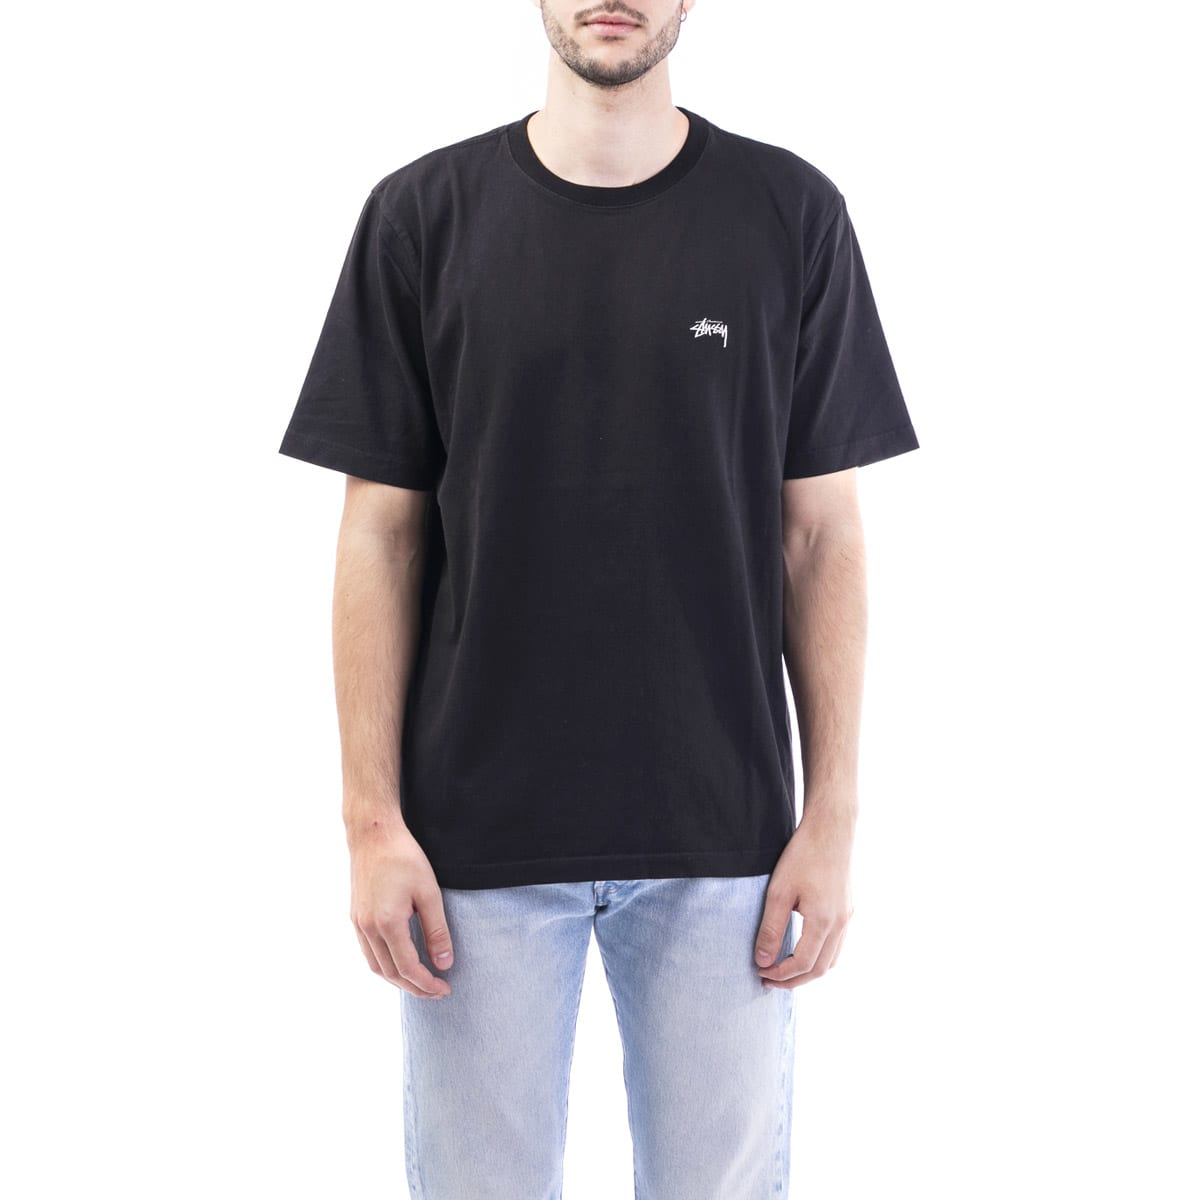 Stussy Cotton T-shirt